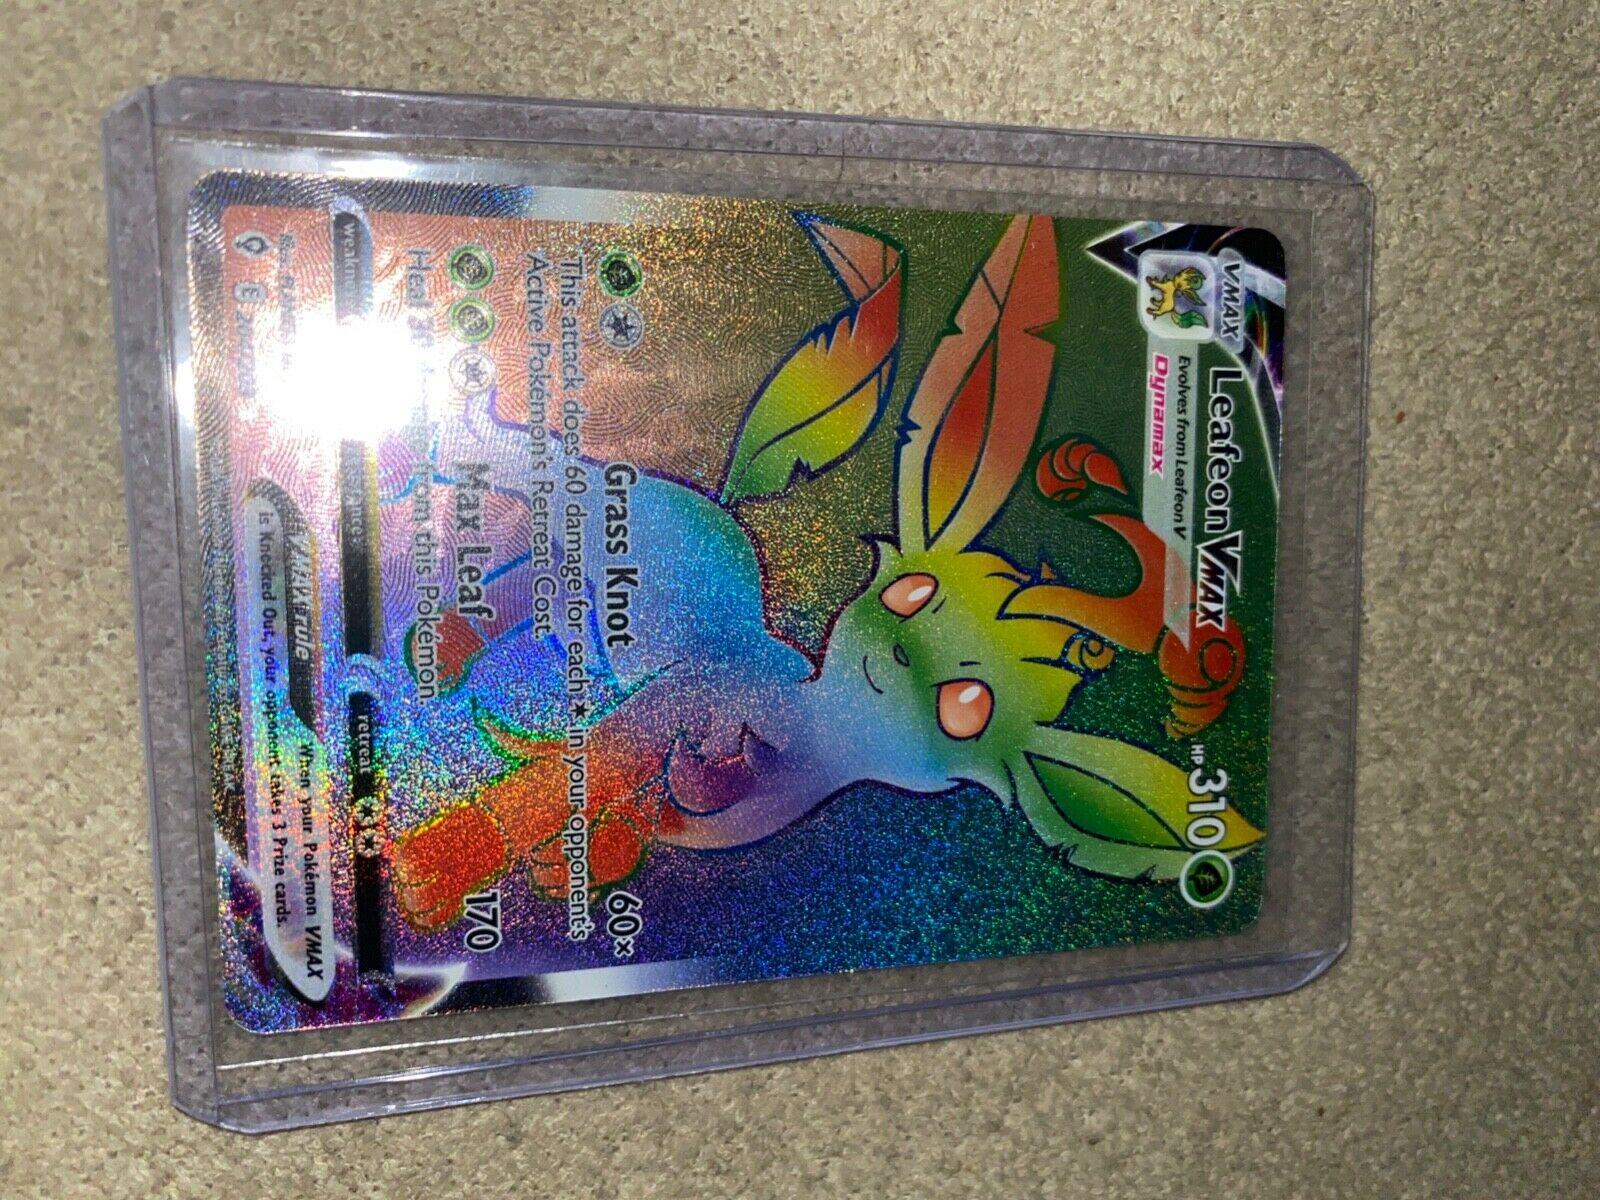 2021 Pokémon Evolving Skies Leafeon VMAX - 204/203 Secret Rare Gem Mint PSA 10